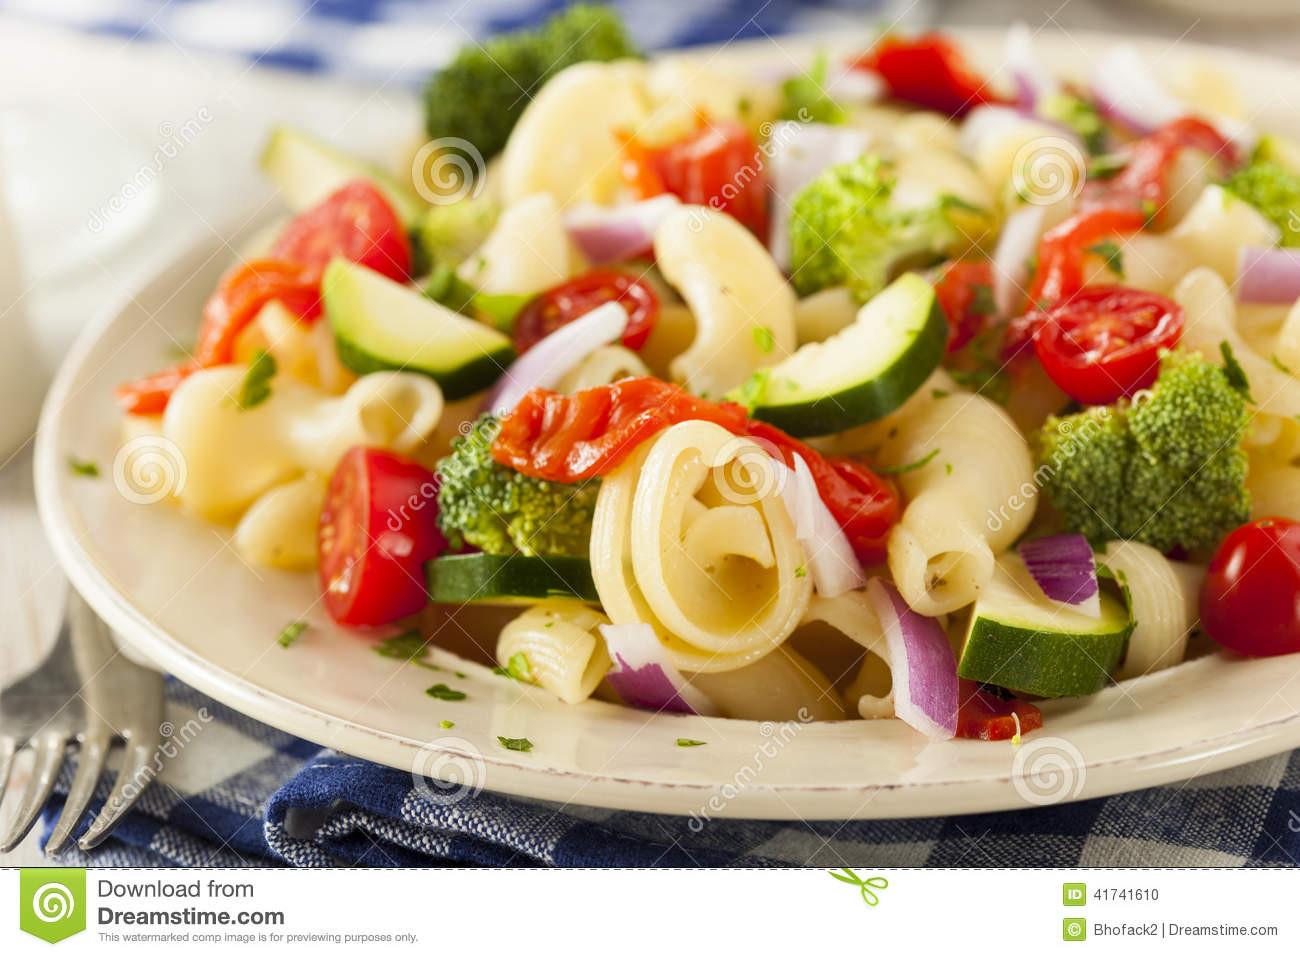 Healthy Homemade Pasta  Healthy Homemade Pasta Salad Stock Image